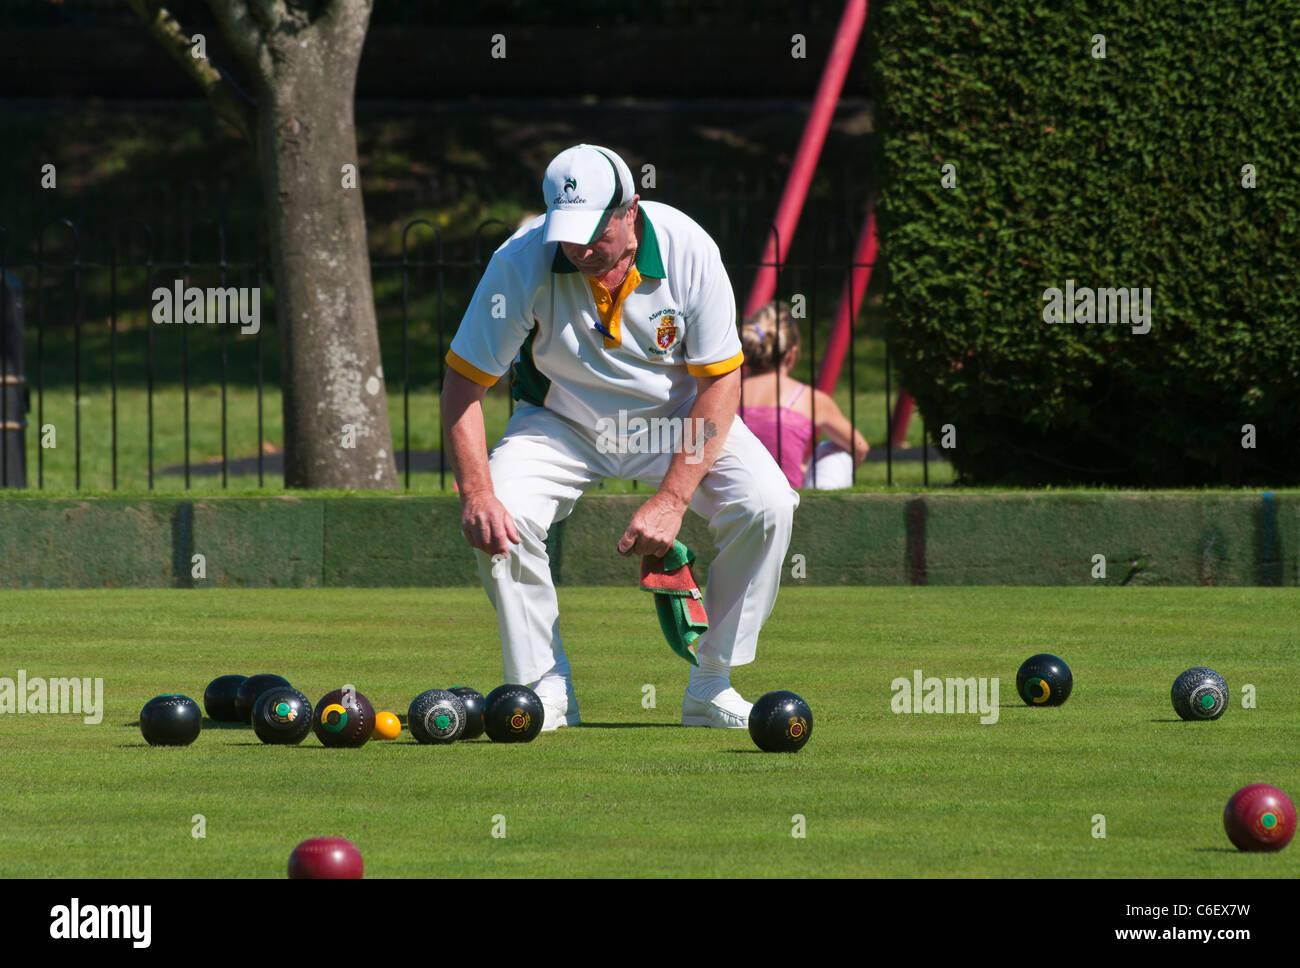 Man Playing Lawn Bowls - Stock Image